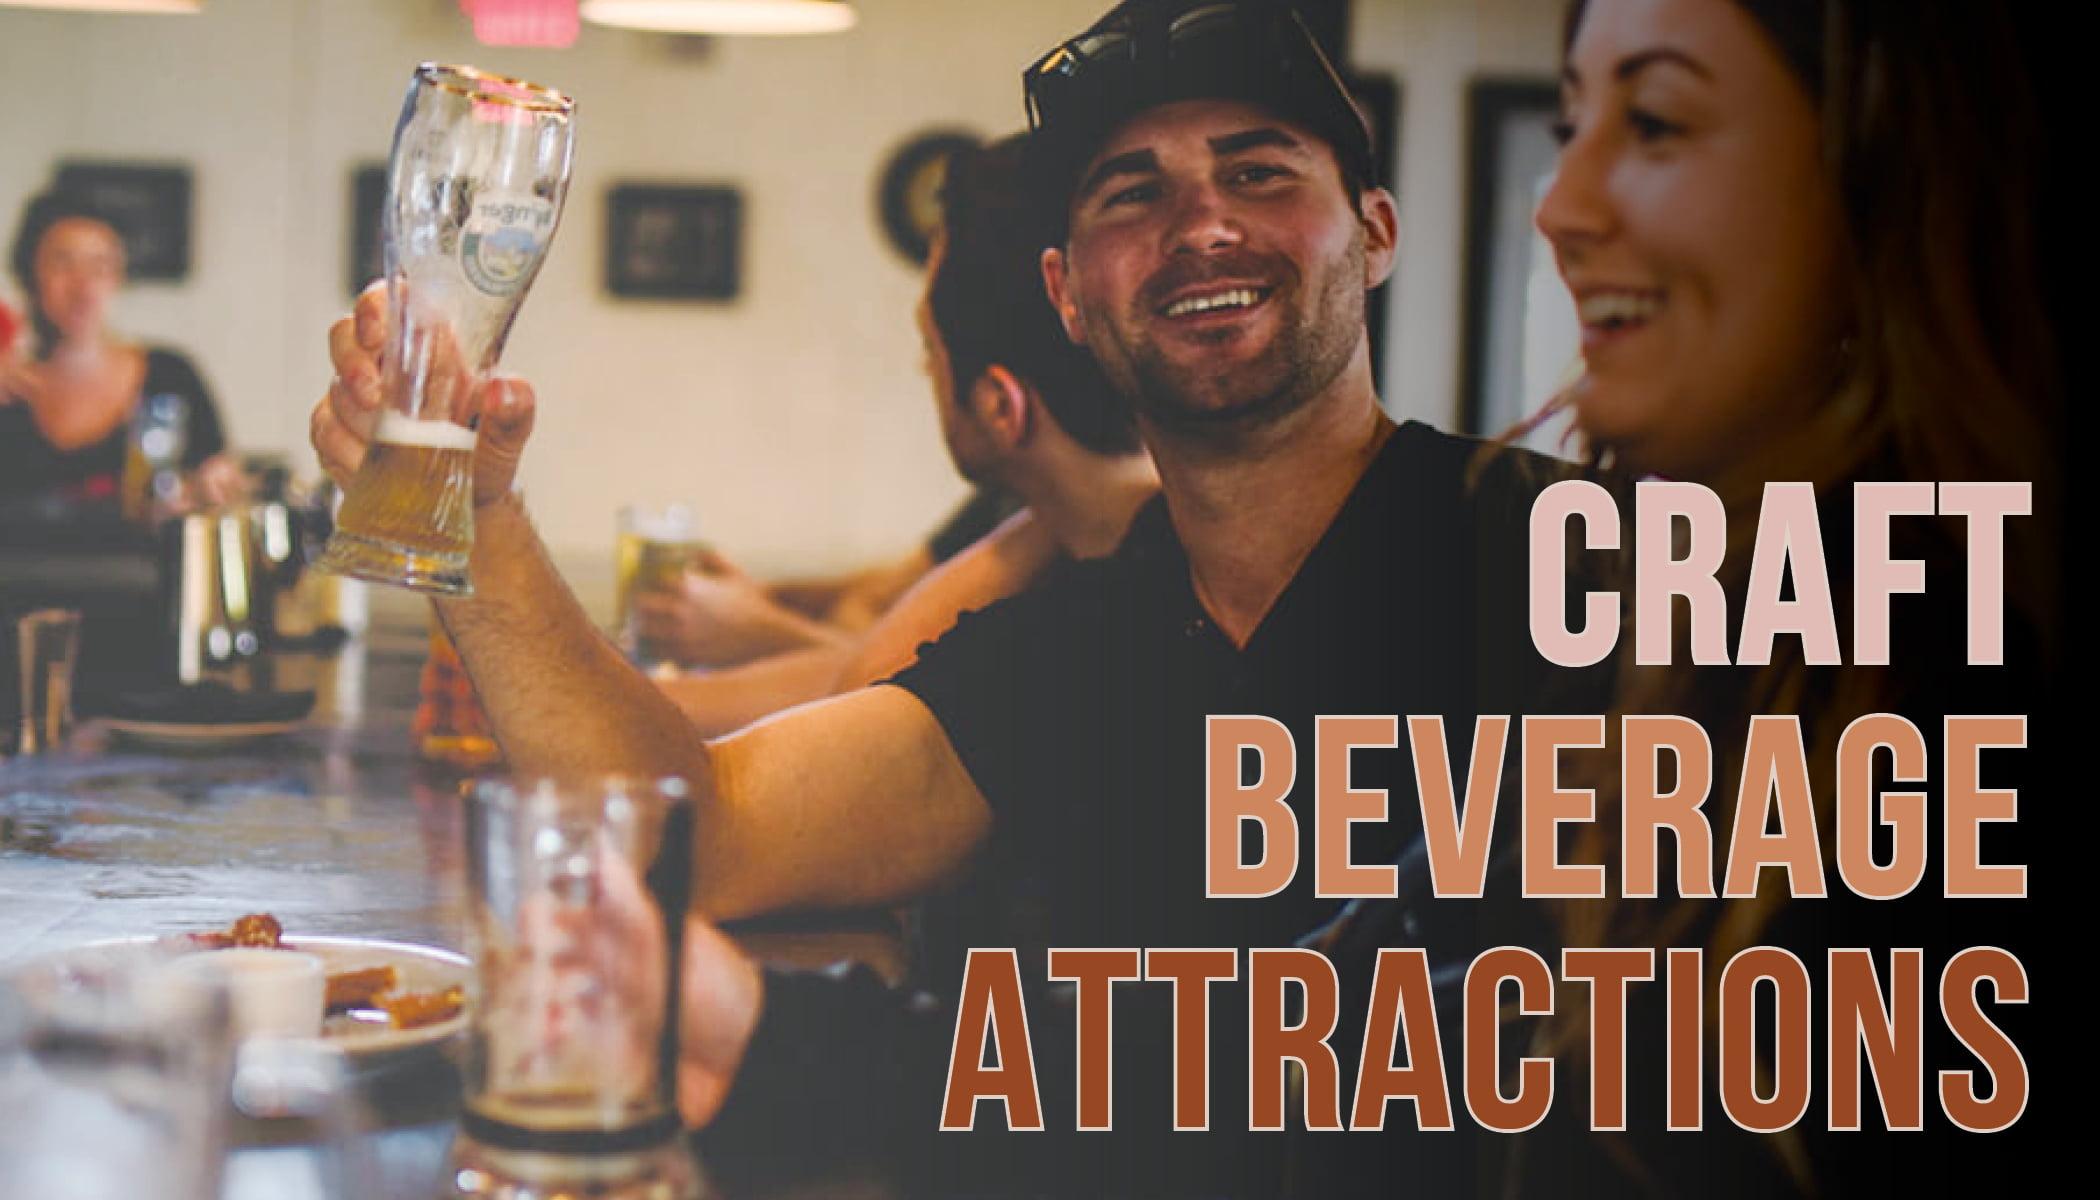 NYS Craft Beverage Attractions Blog Header